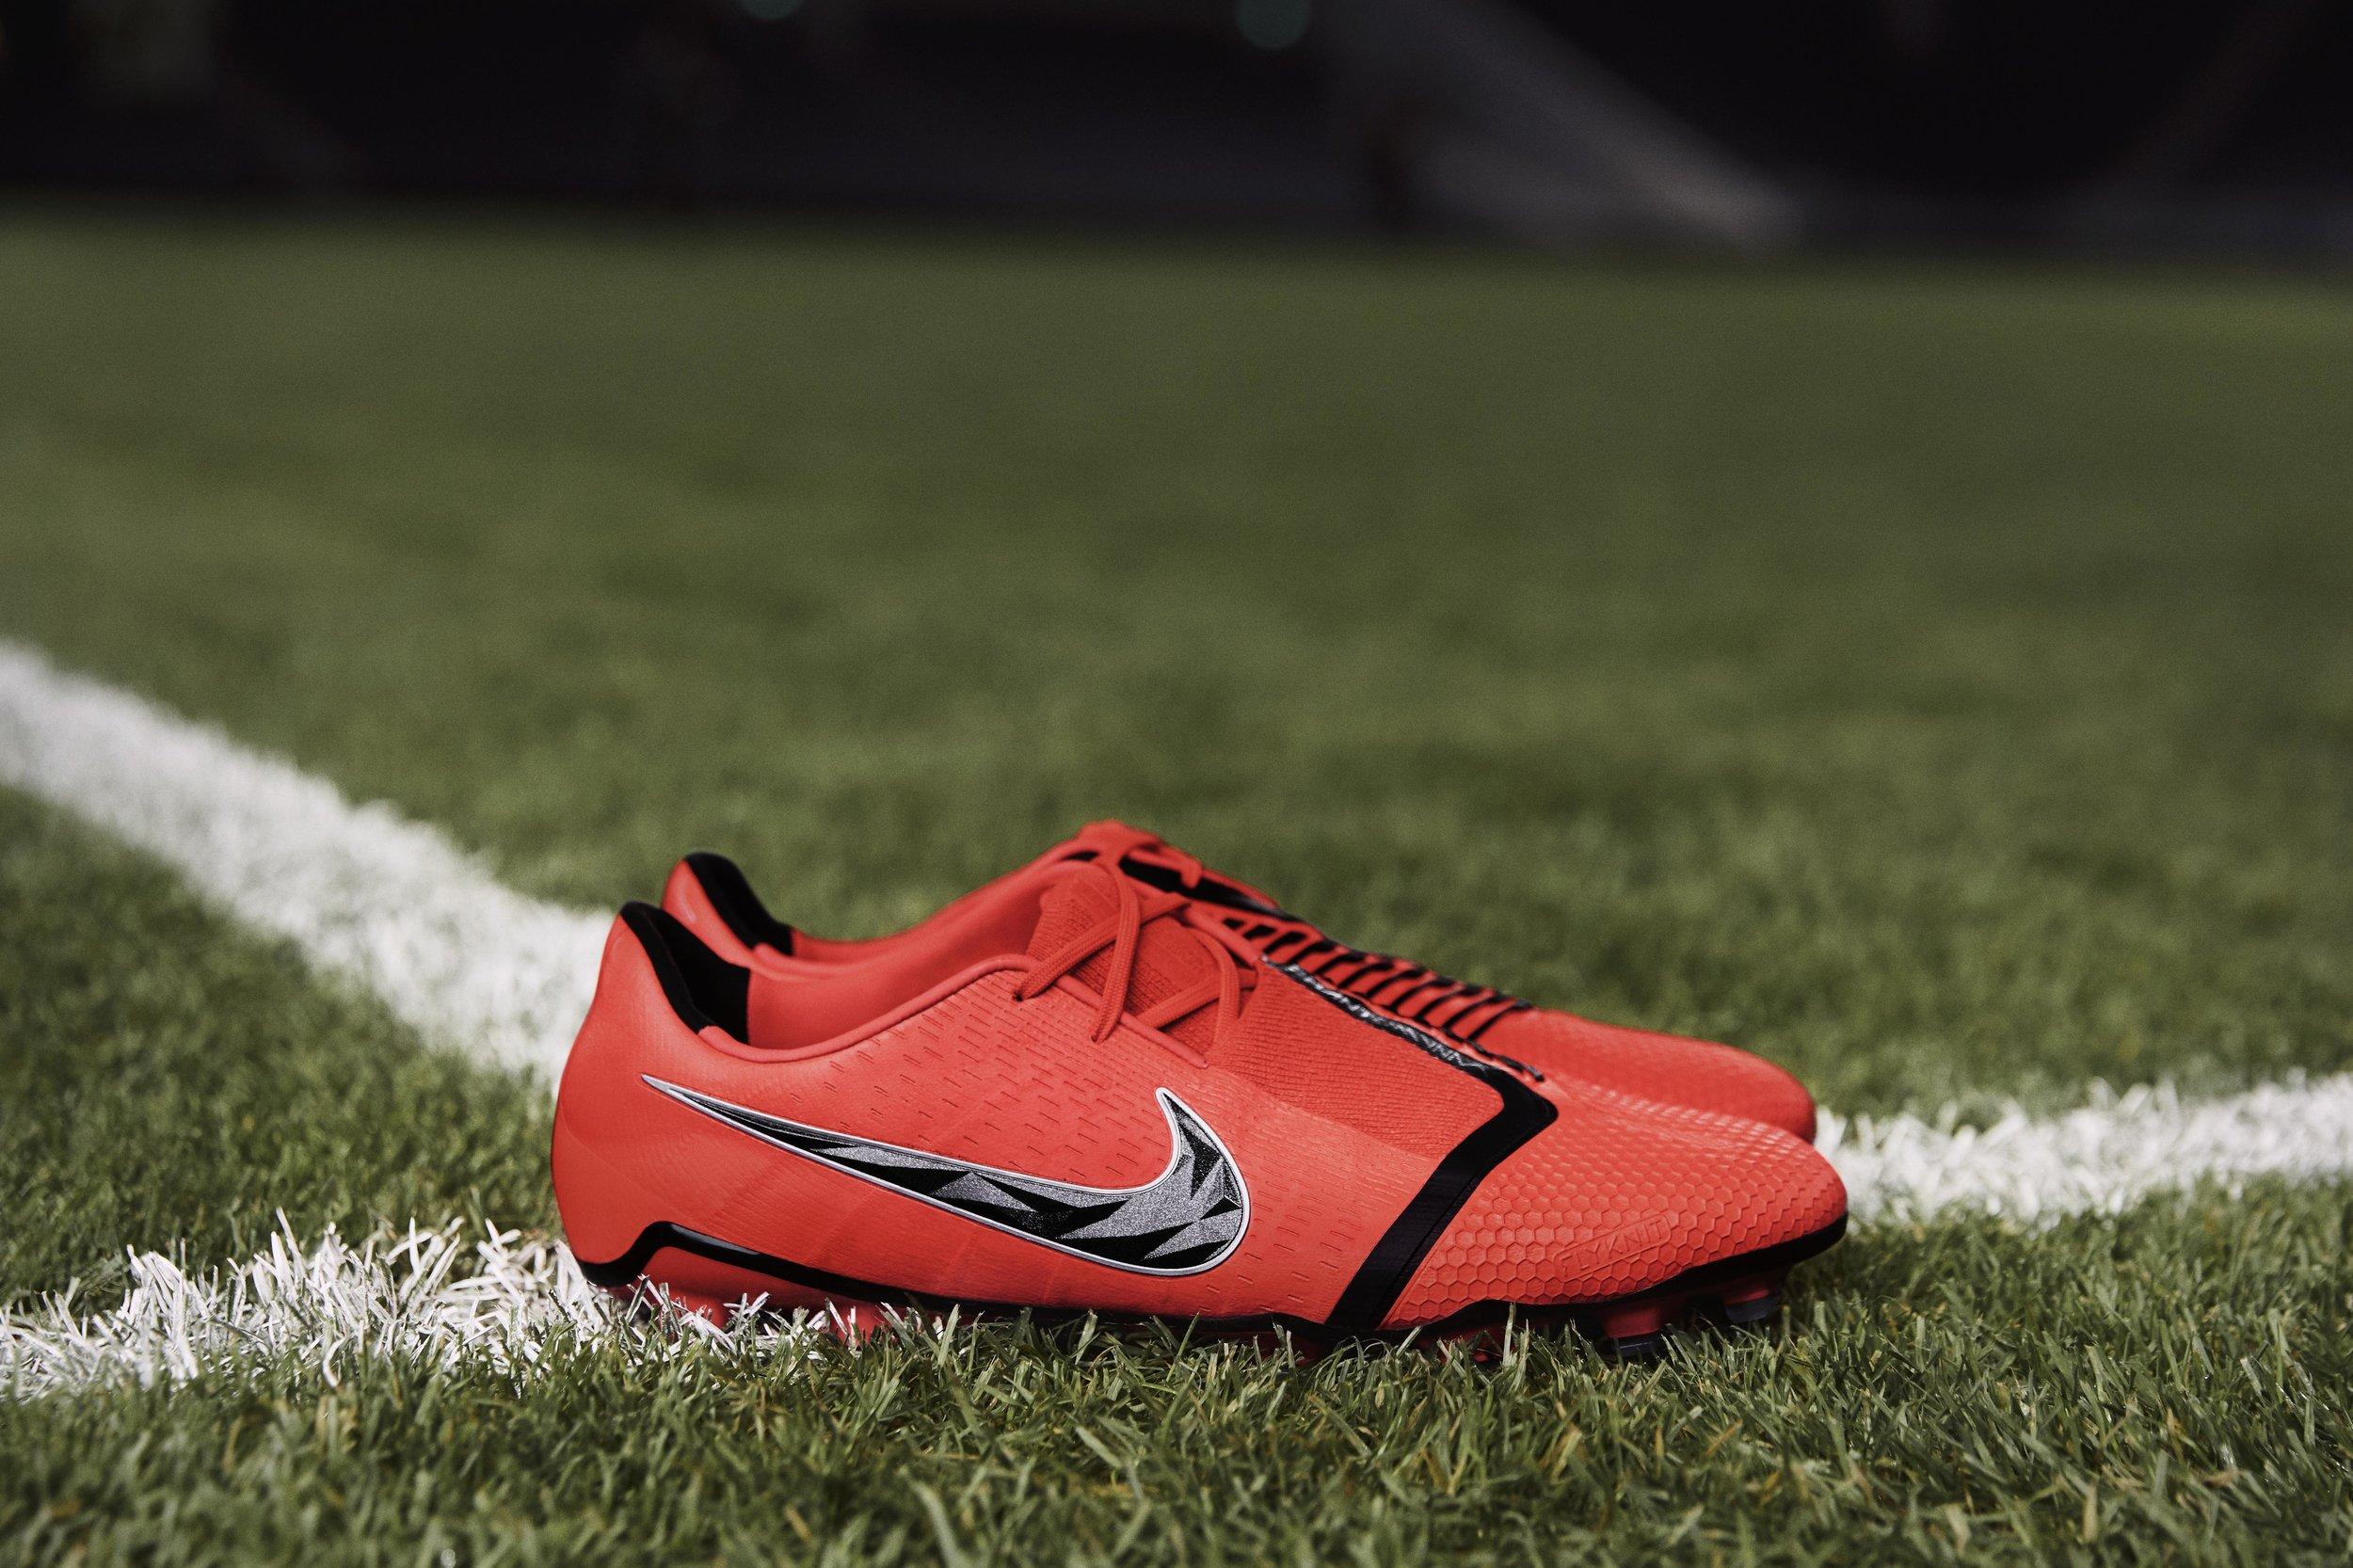 Nike-phantomvnm-boot-ronnell-humes-womens-sport.jpg